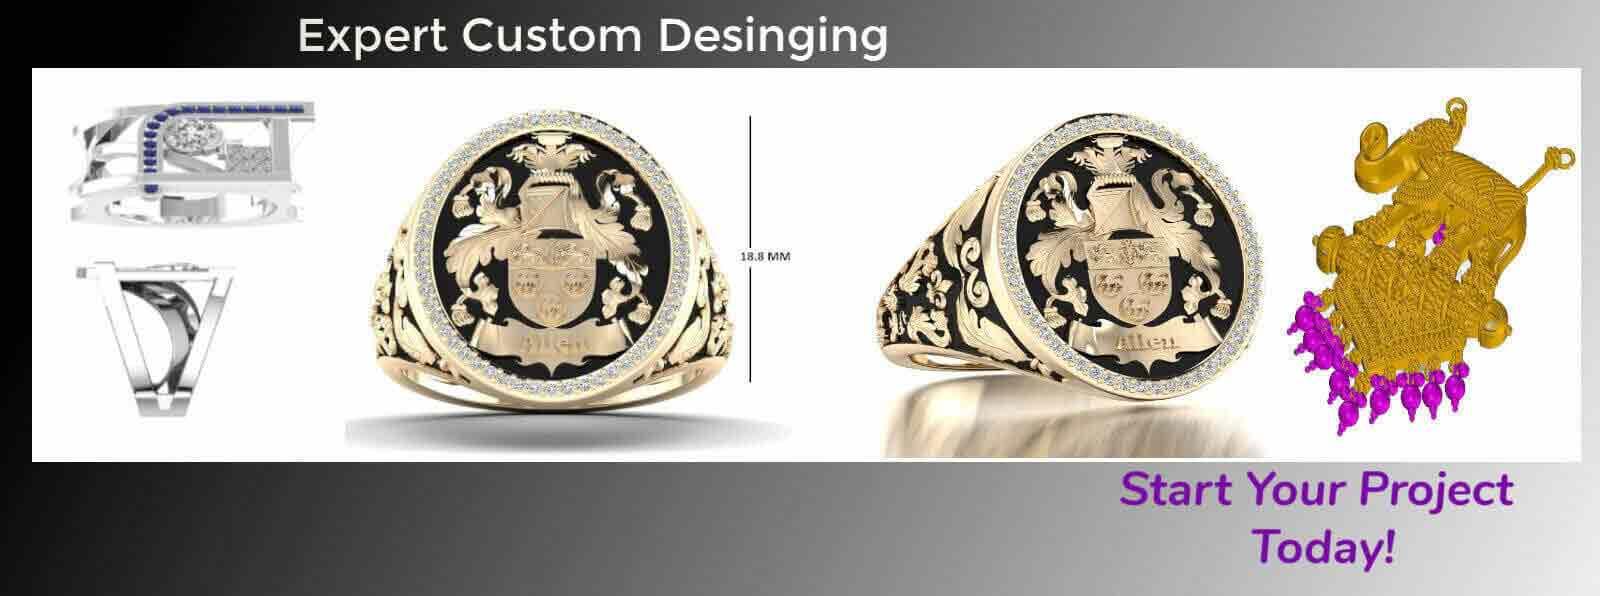 Expert custom Desinging